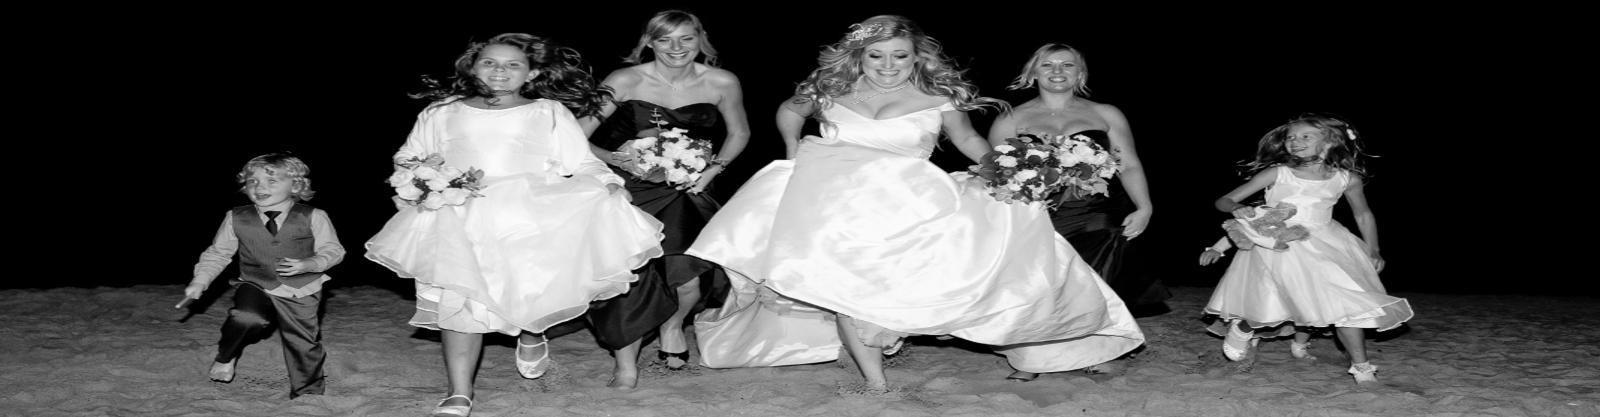 evening-wedding-reception-beach-alumchine